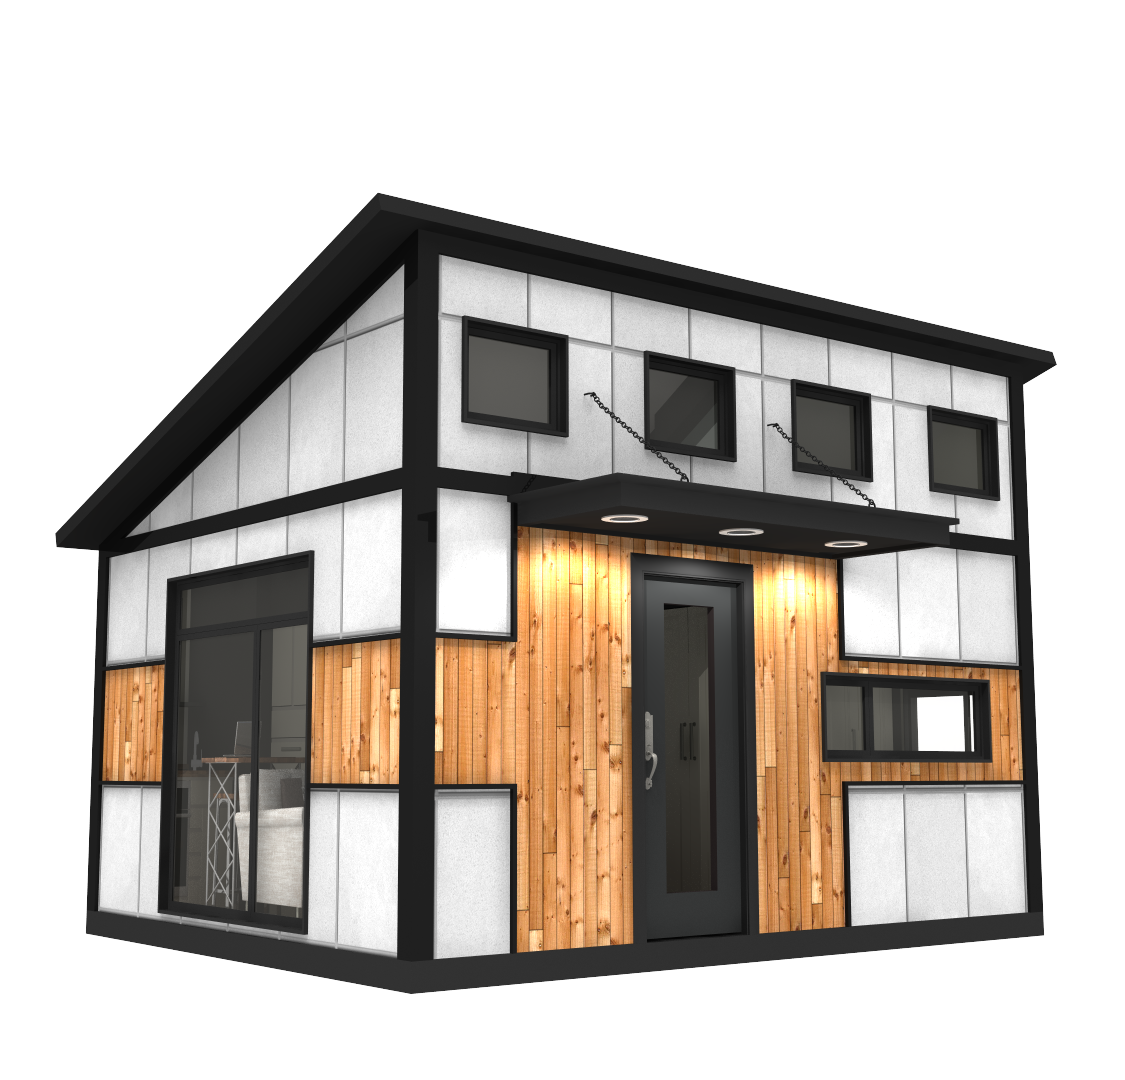 henko wohnwagen pinterest berseecontainer bauideen und wohnwagen. Black Bedroom Furniture Sets. Home Design Ideas